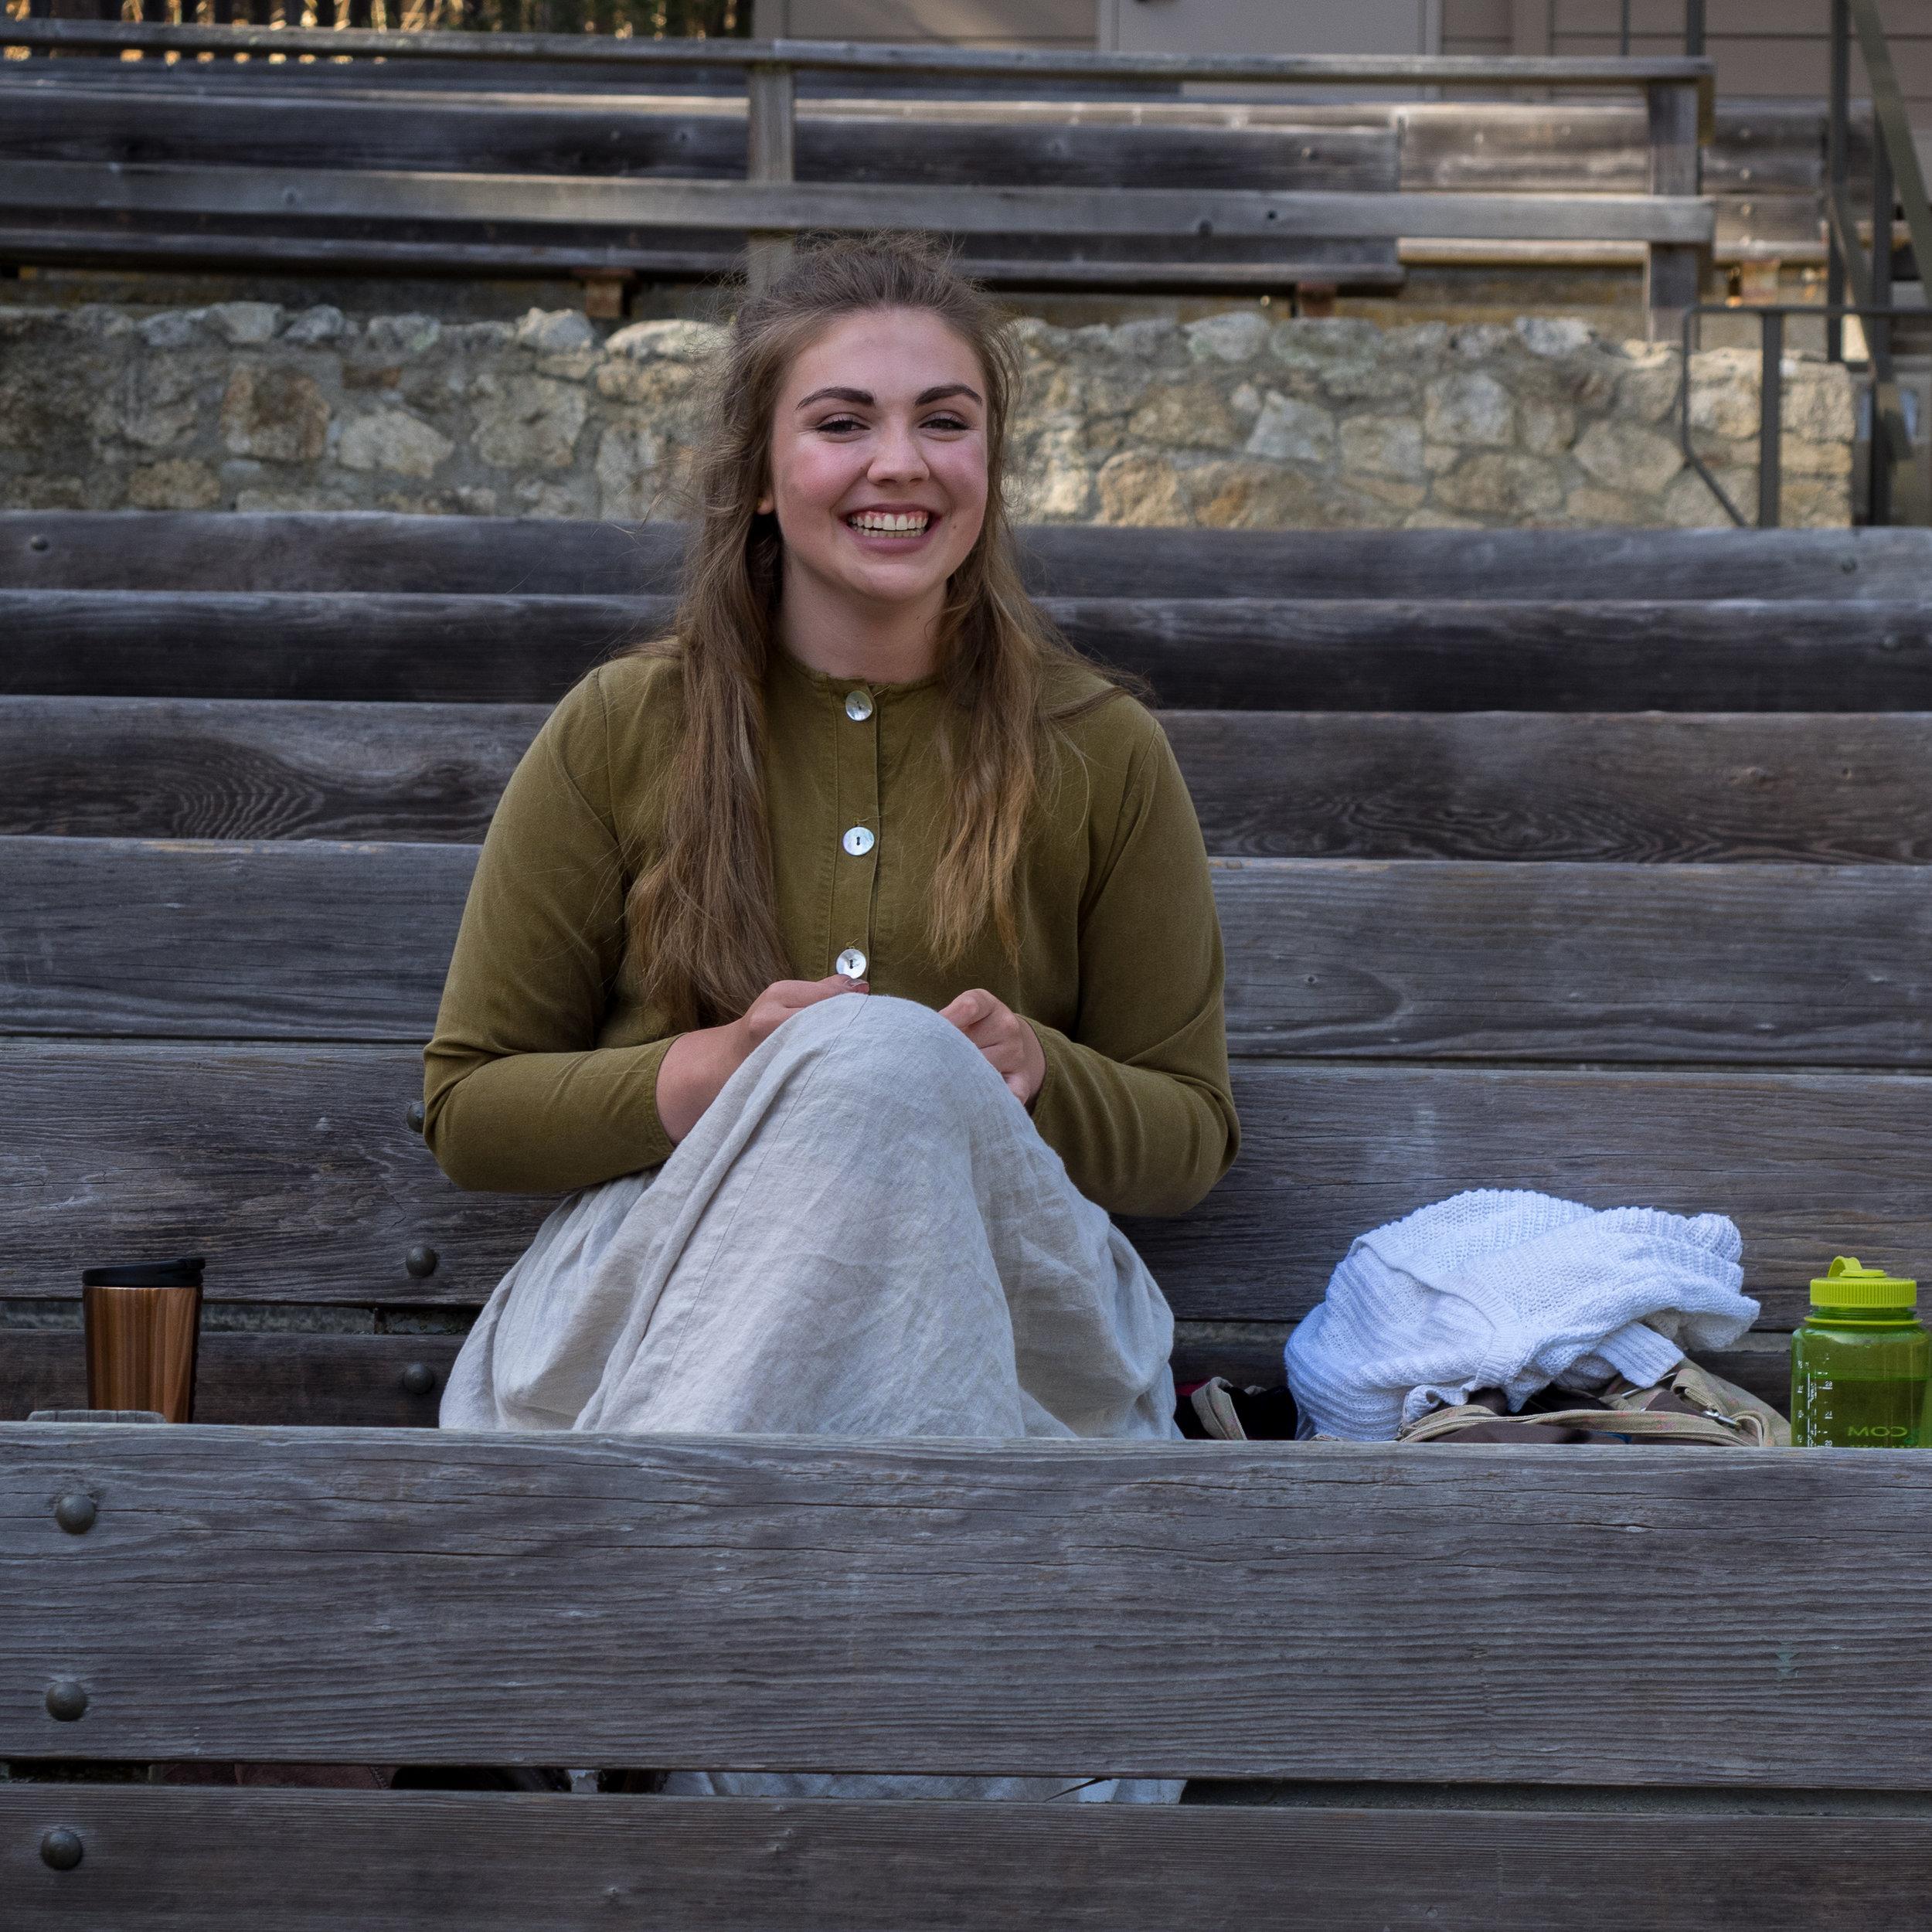 Ashley Lyon smiles as she awaits her call for Man of La Mancha 2017